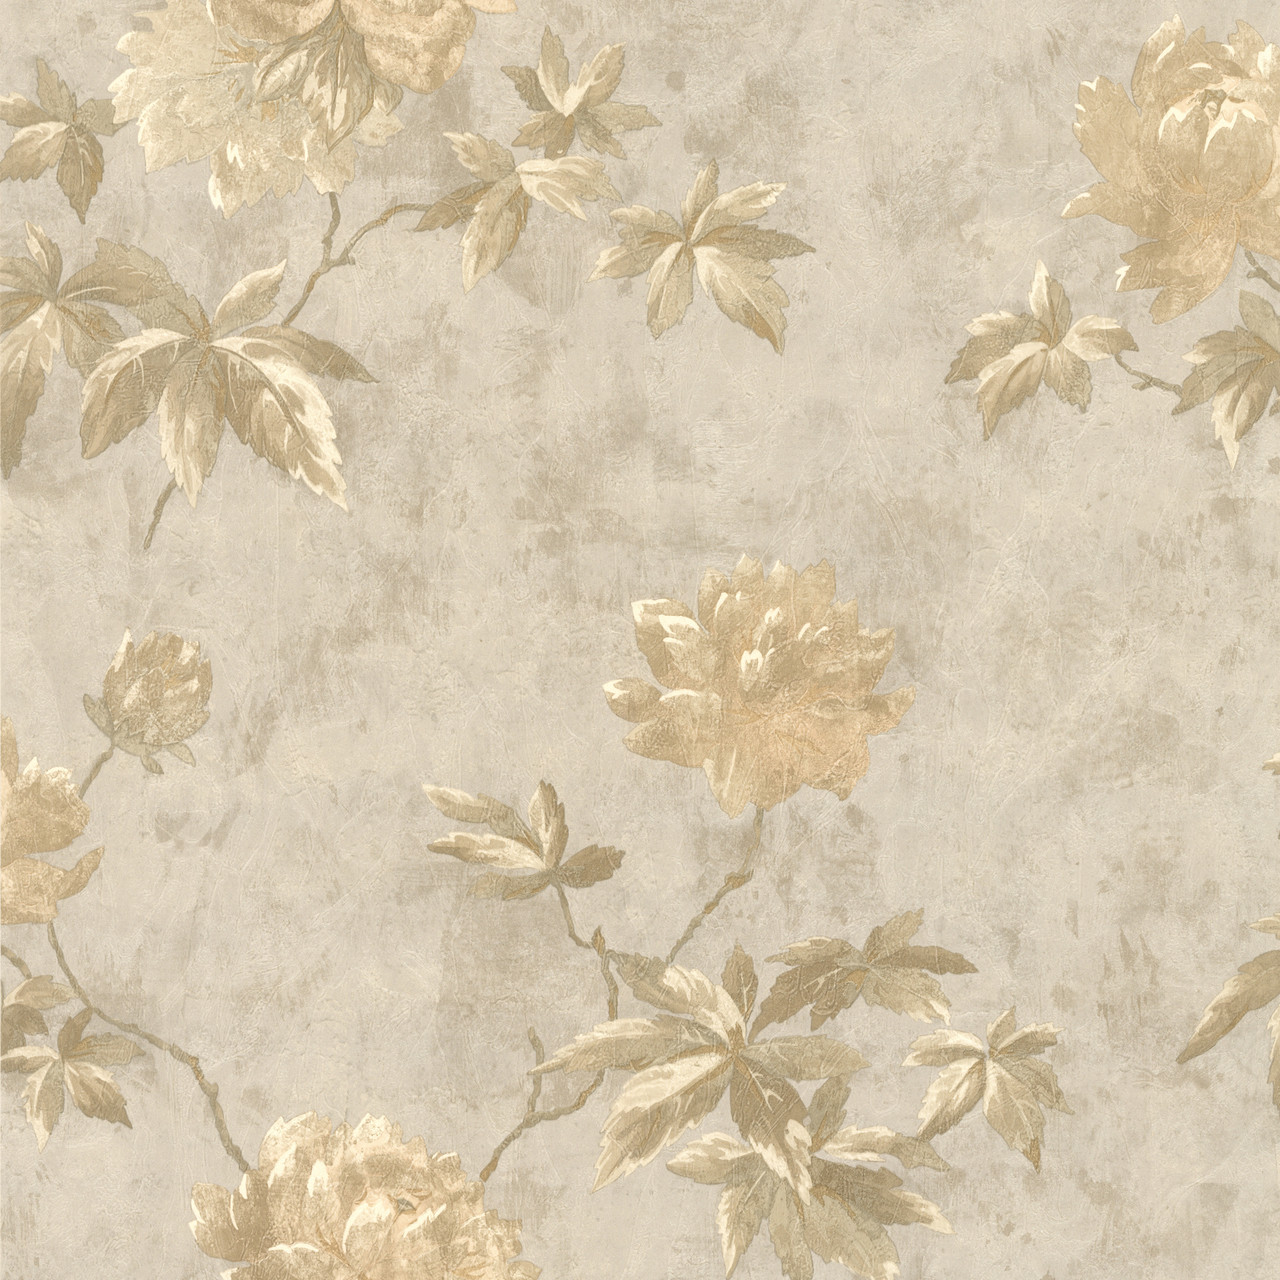 414 54263 Carmela Silver Floral Wallpaper